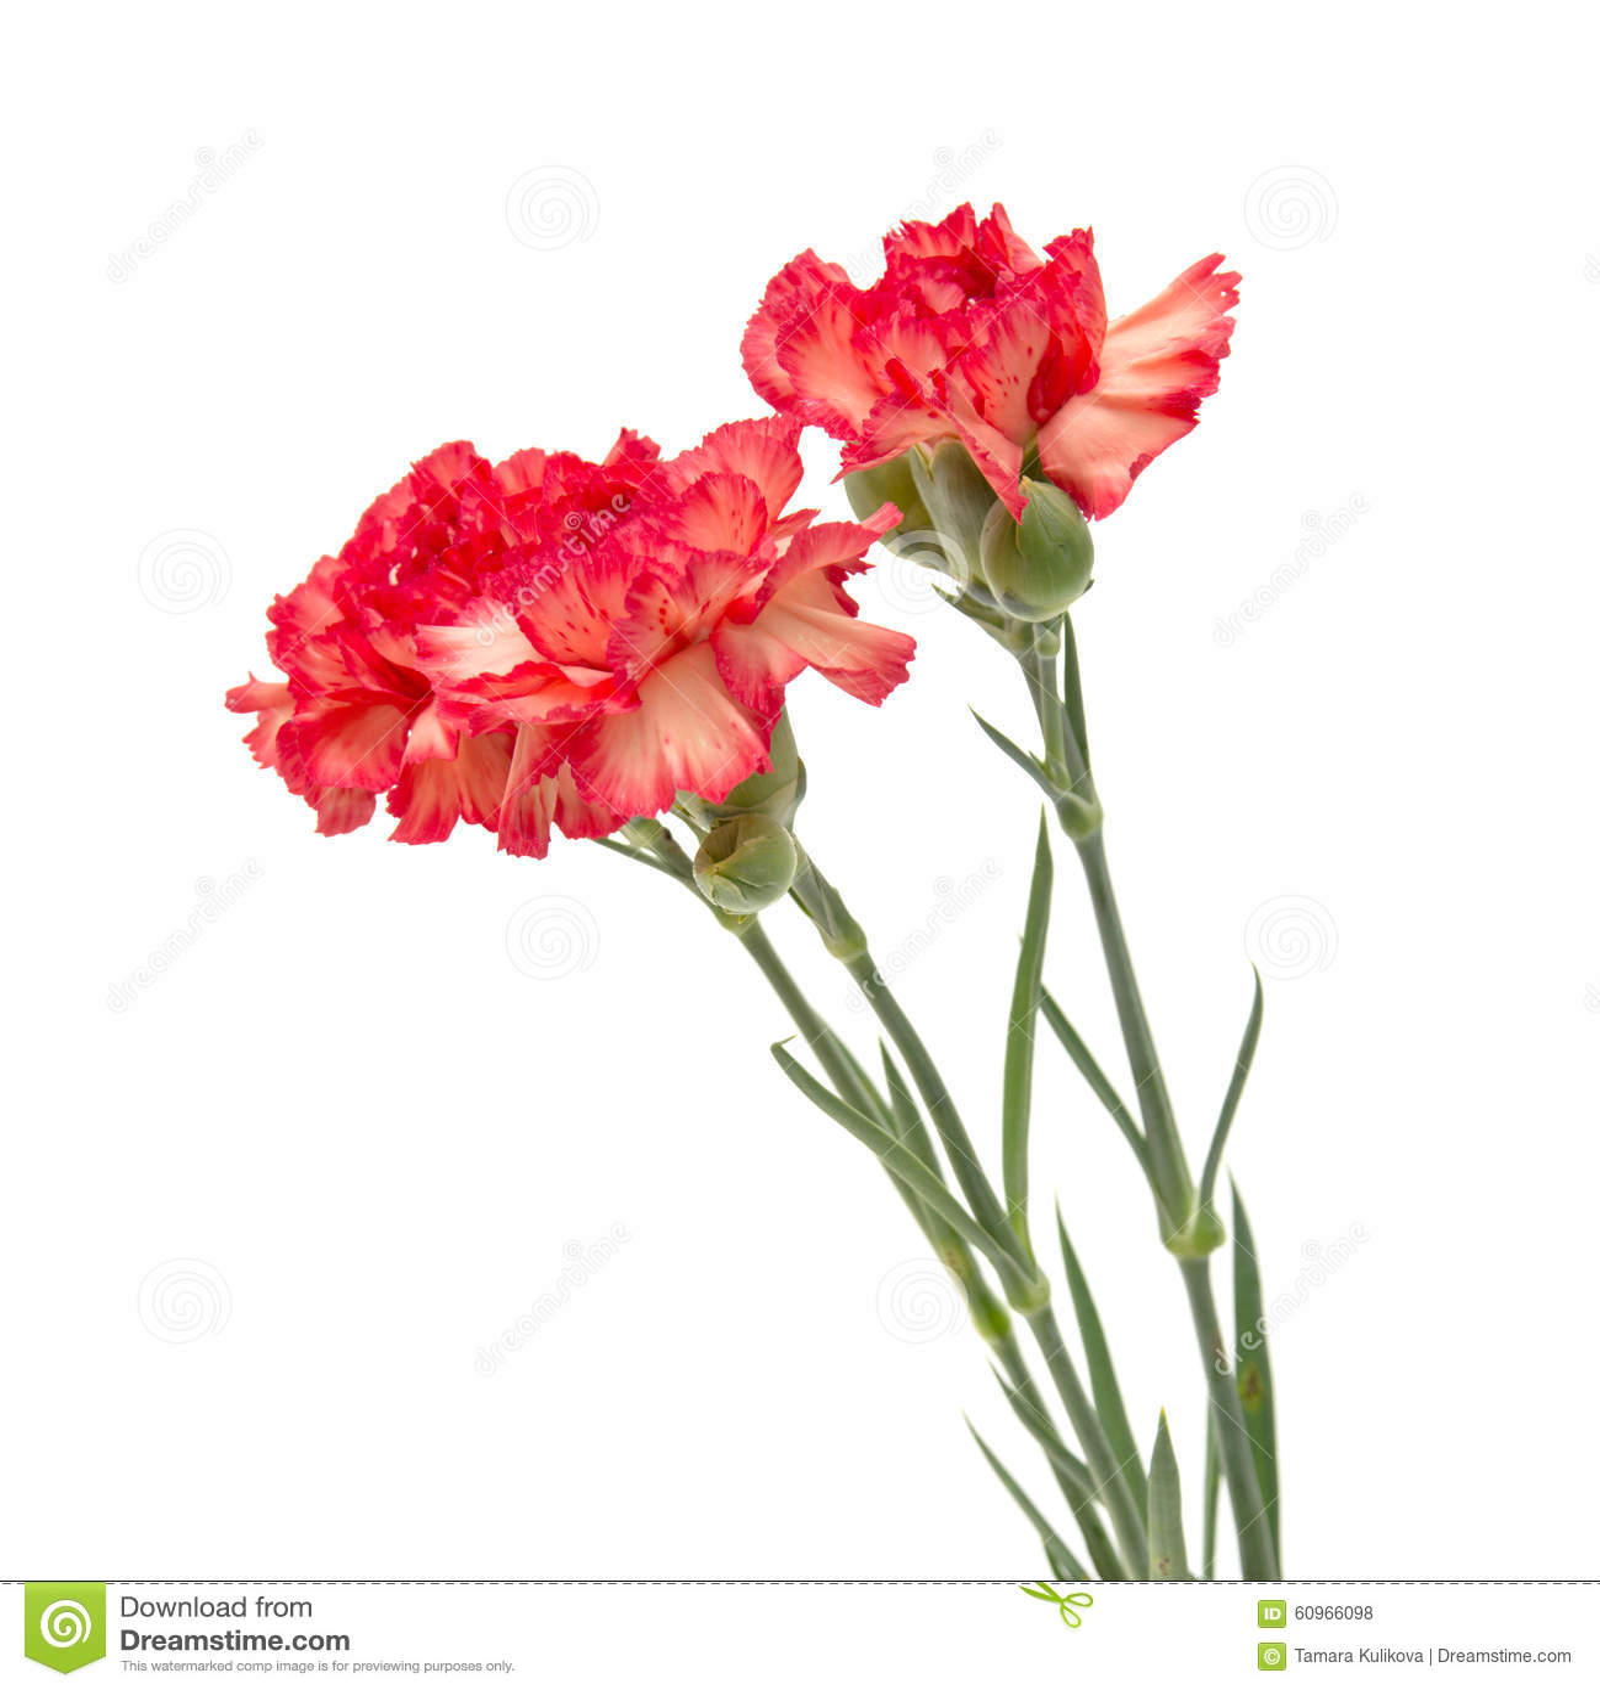 Where Buy Fresh Cut Flowers